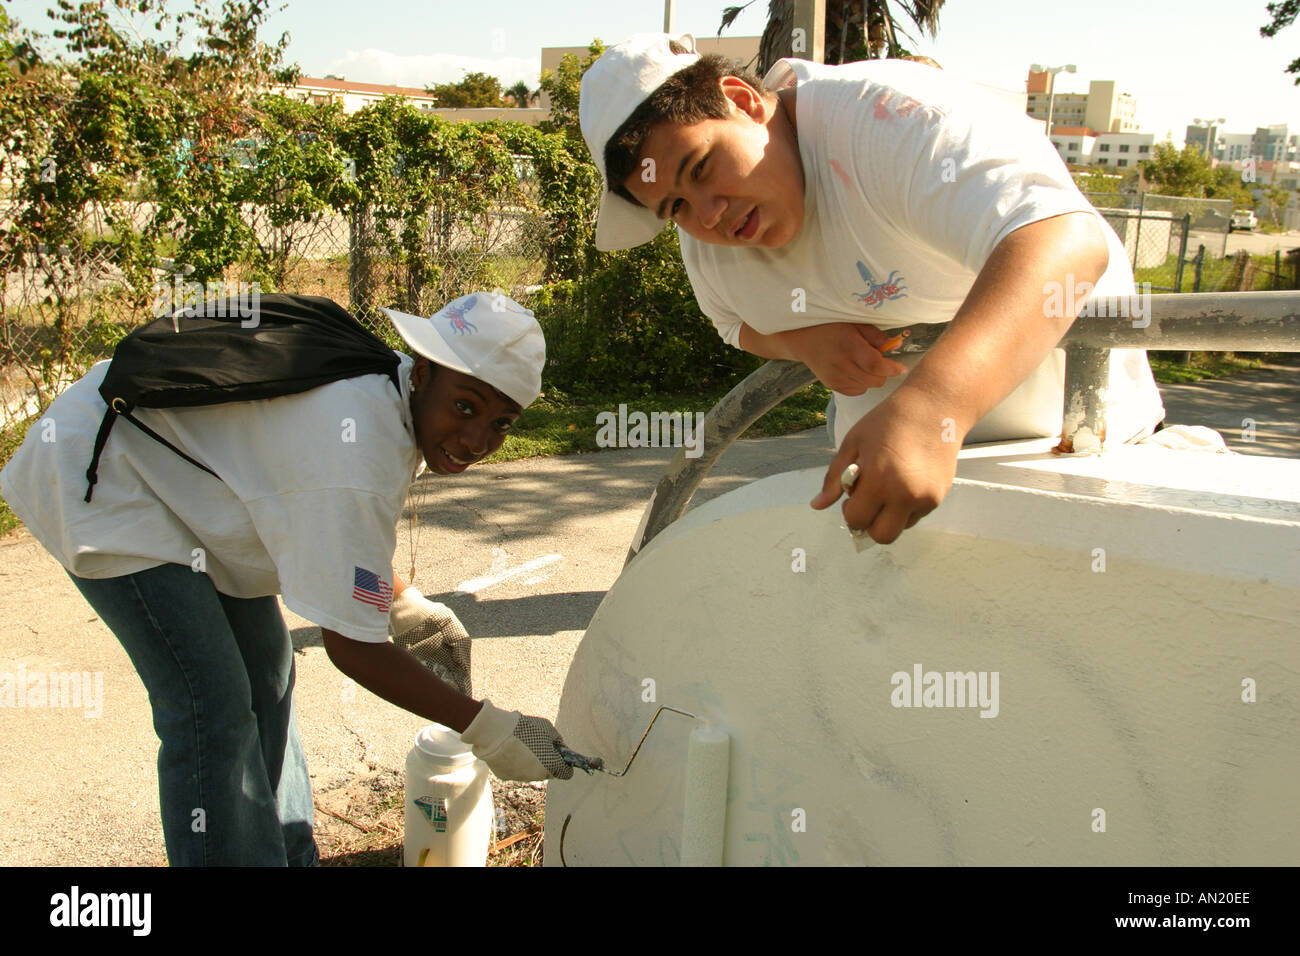 miami beach florida teen job corps students clean up along tatum miami beach florida teen job corps students clean up along tatum waterway near painting over graffiti